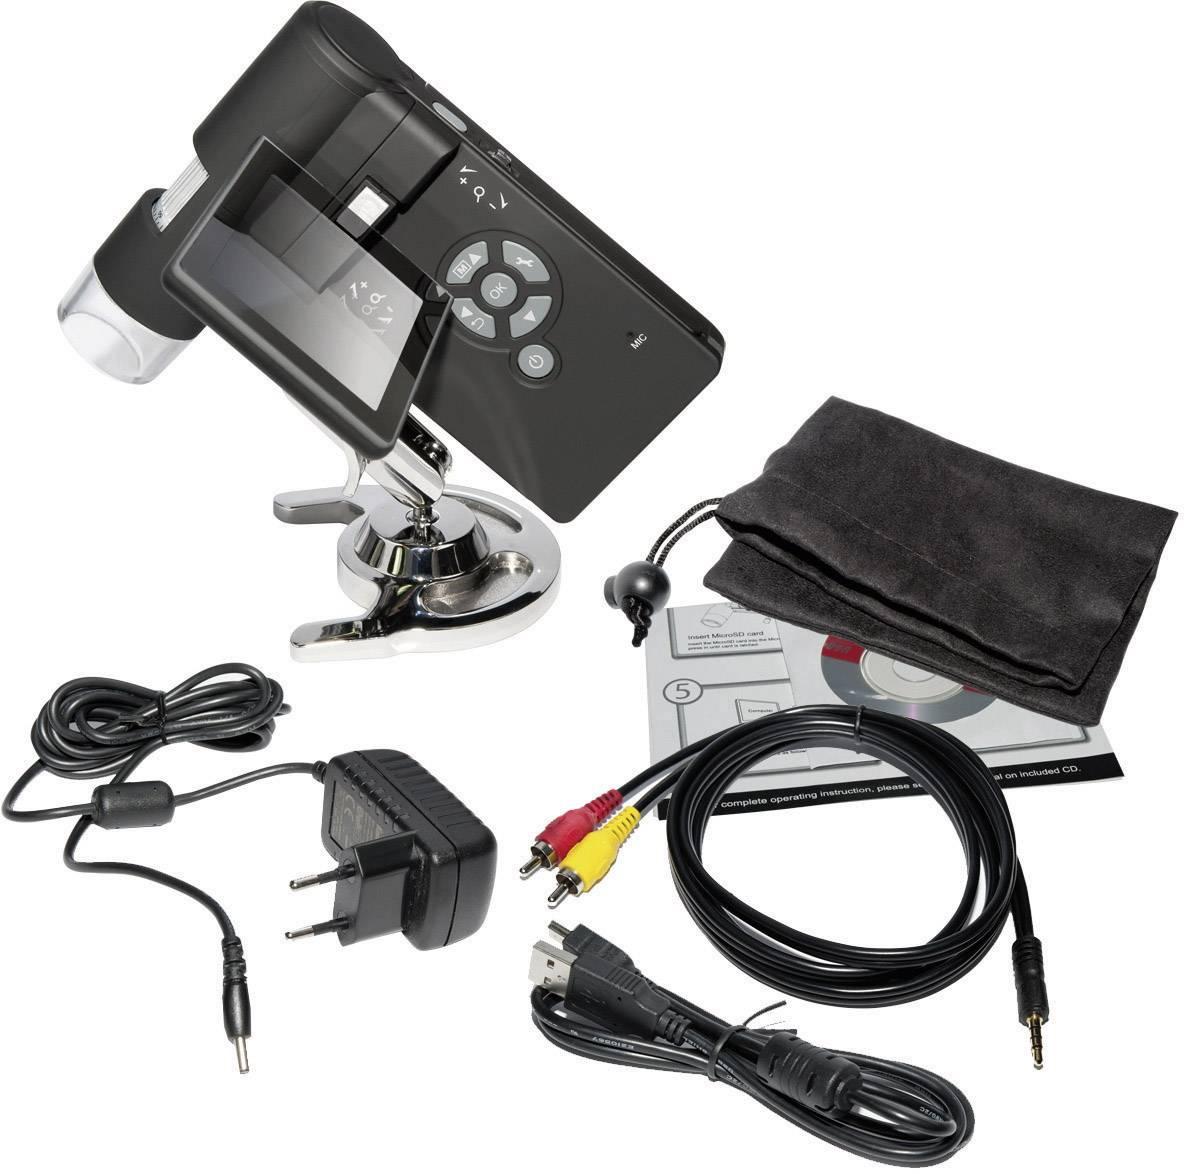 Digitálna mikroskopická kamera DigiMicro Mobile